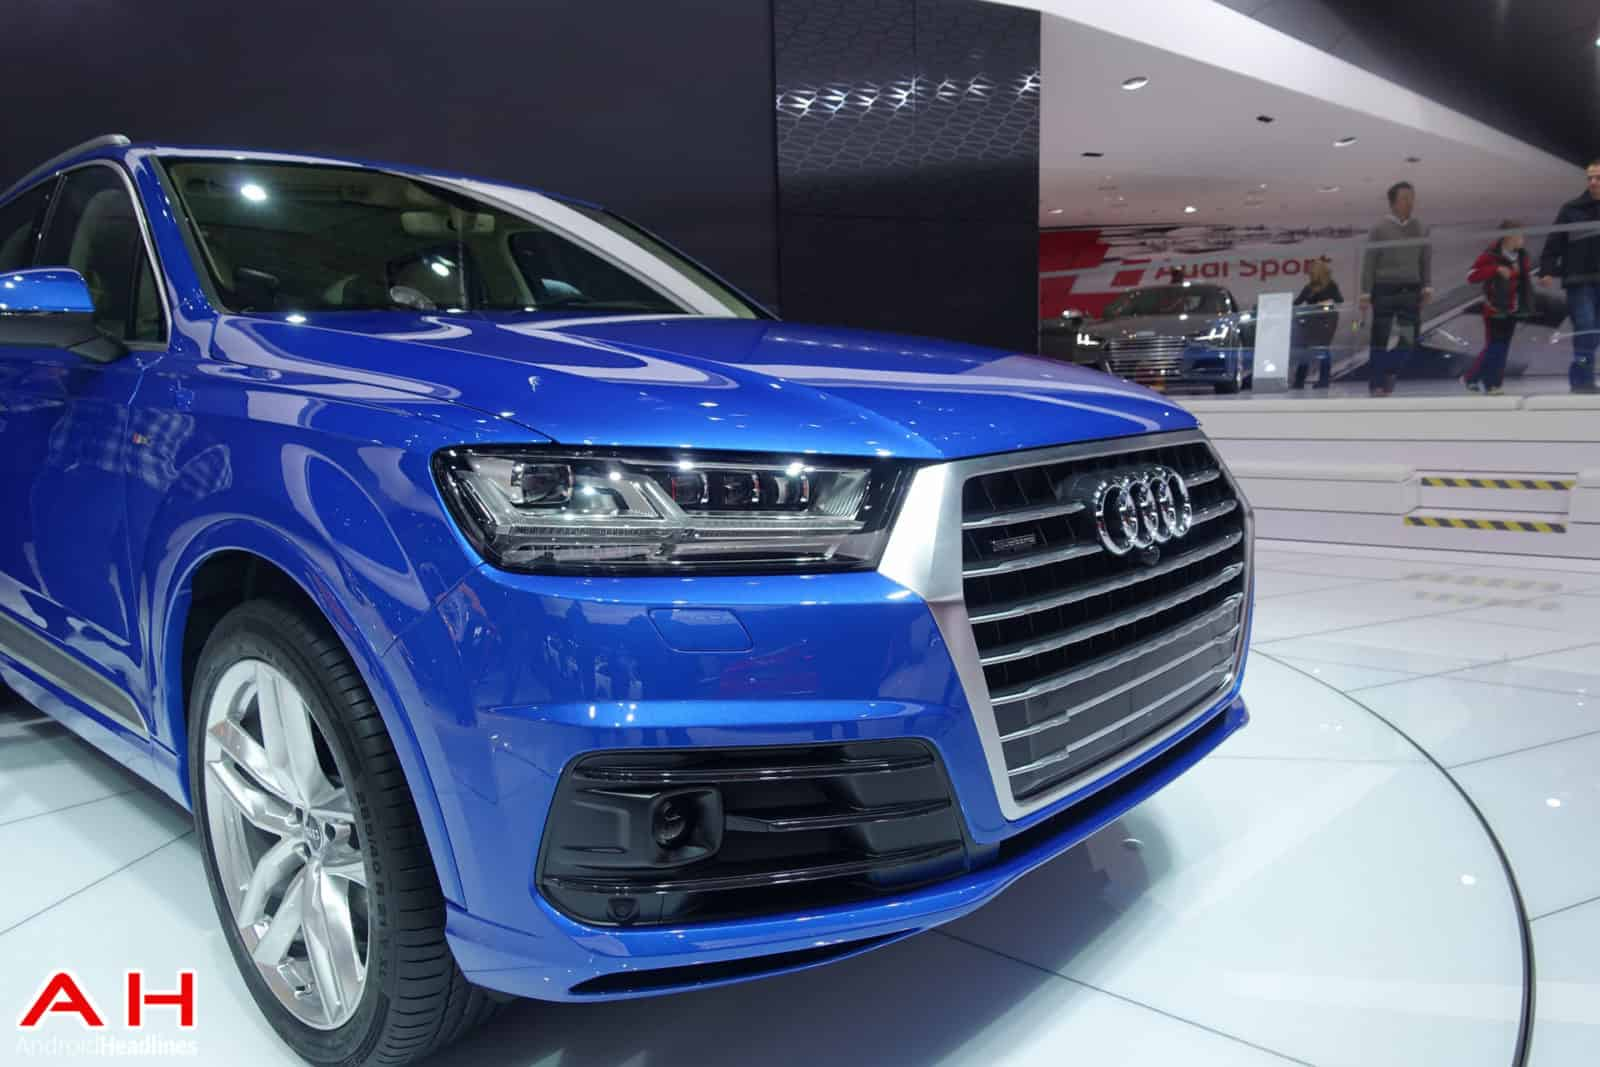 Audi-Q7-AH-1